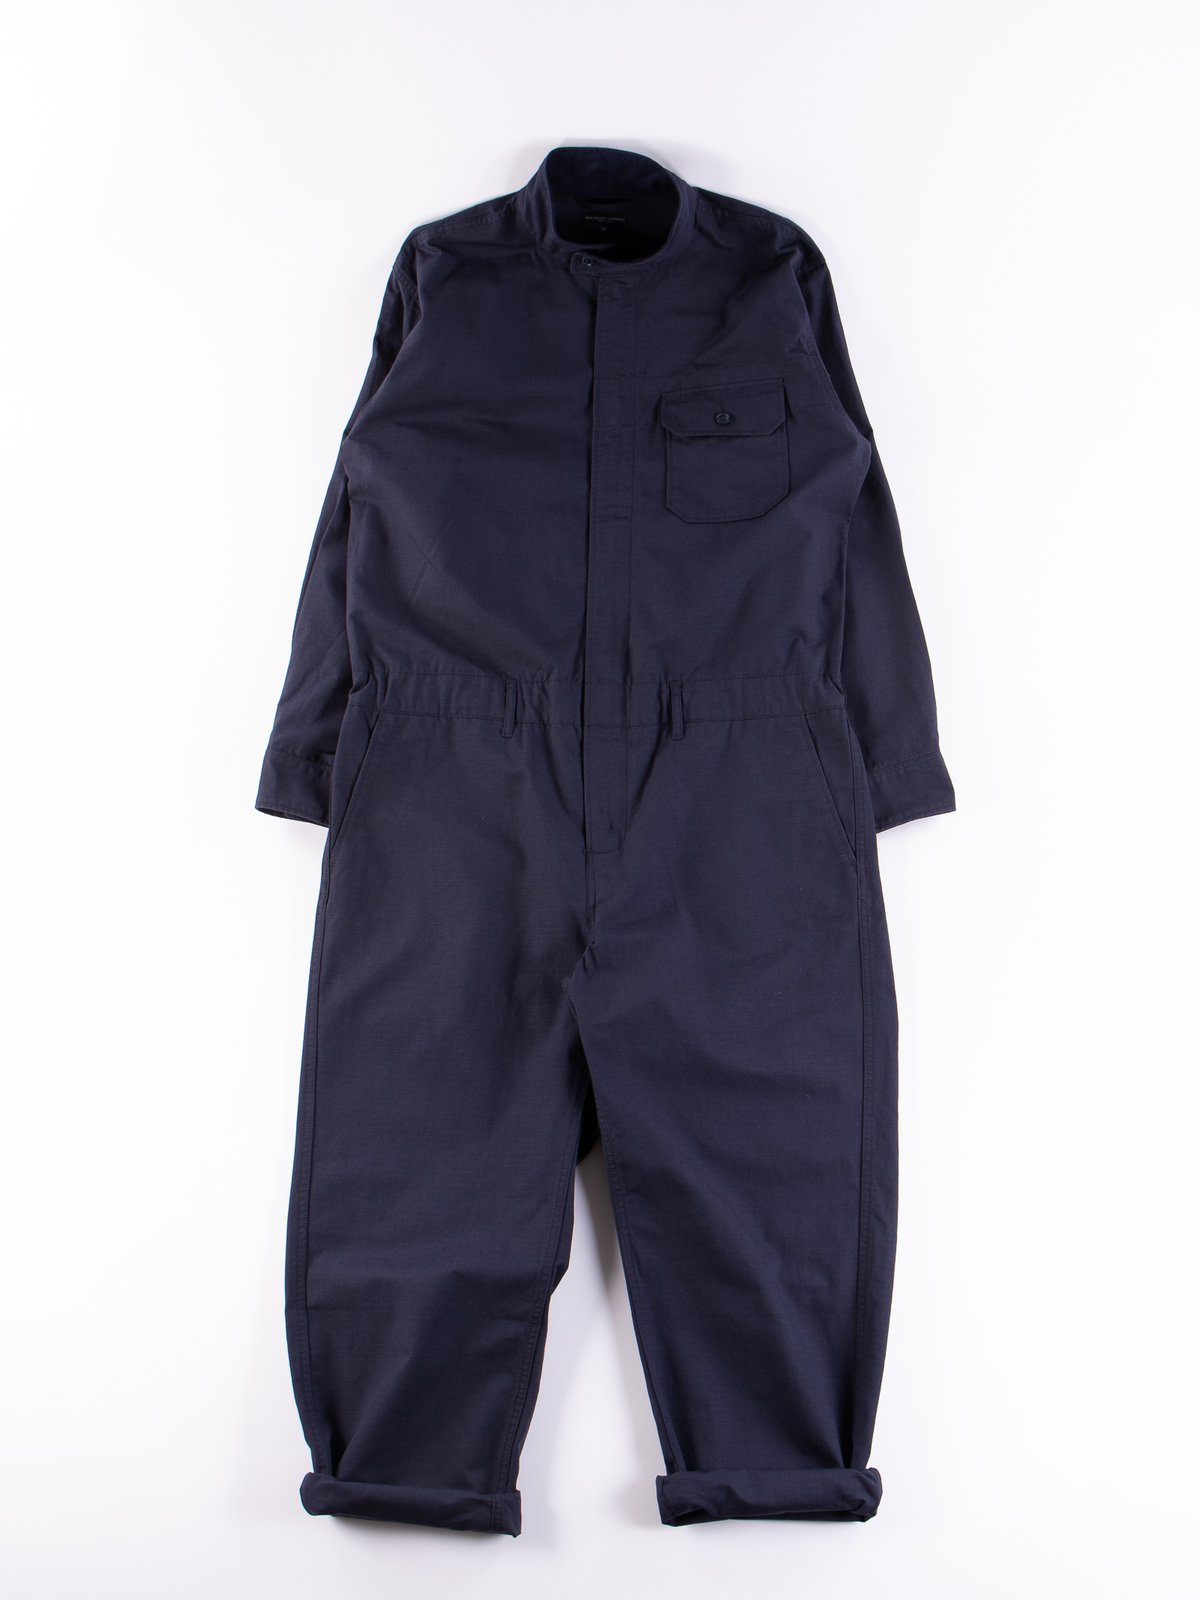 Dark Navy Cotton Ripstop Boiler Suit - Image 1